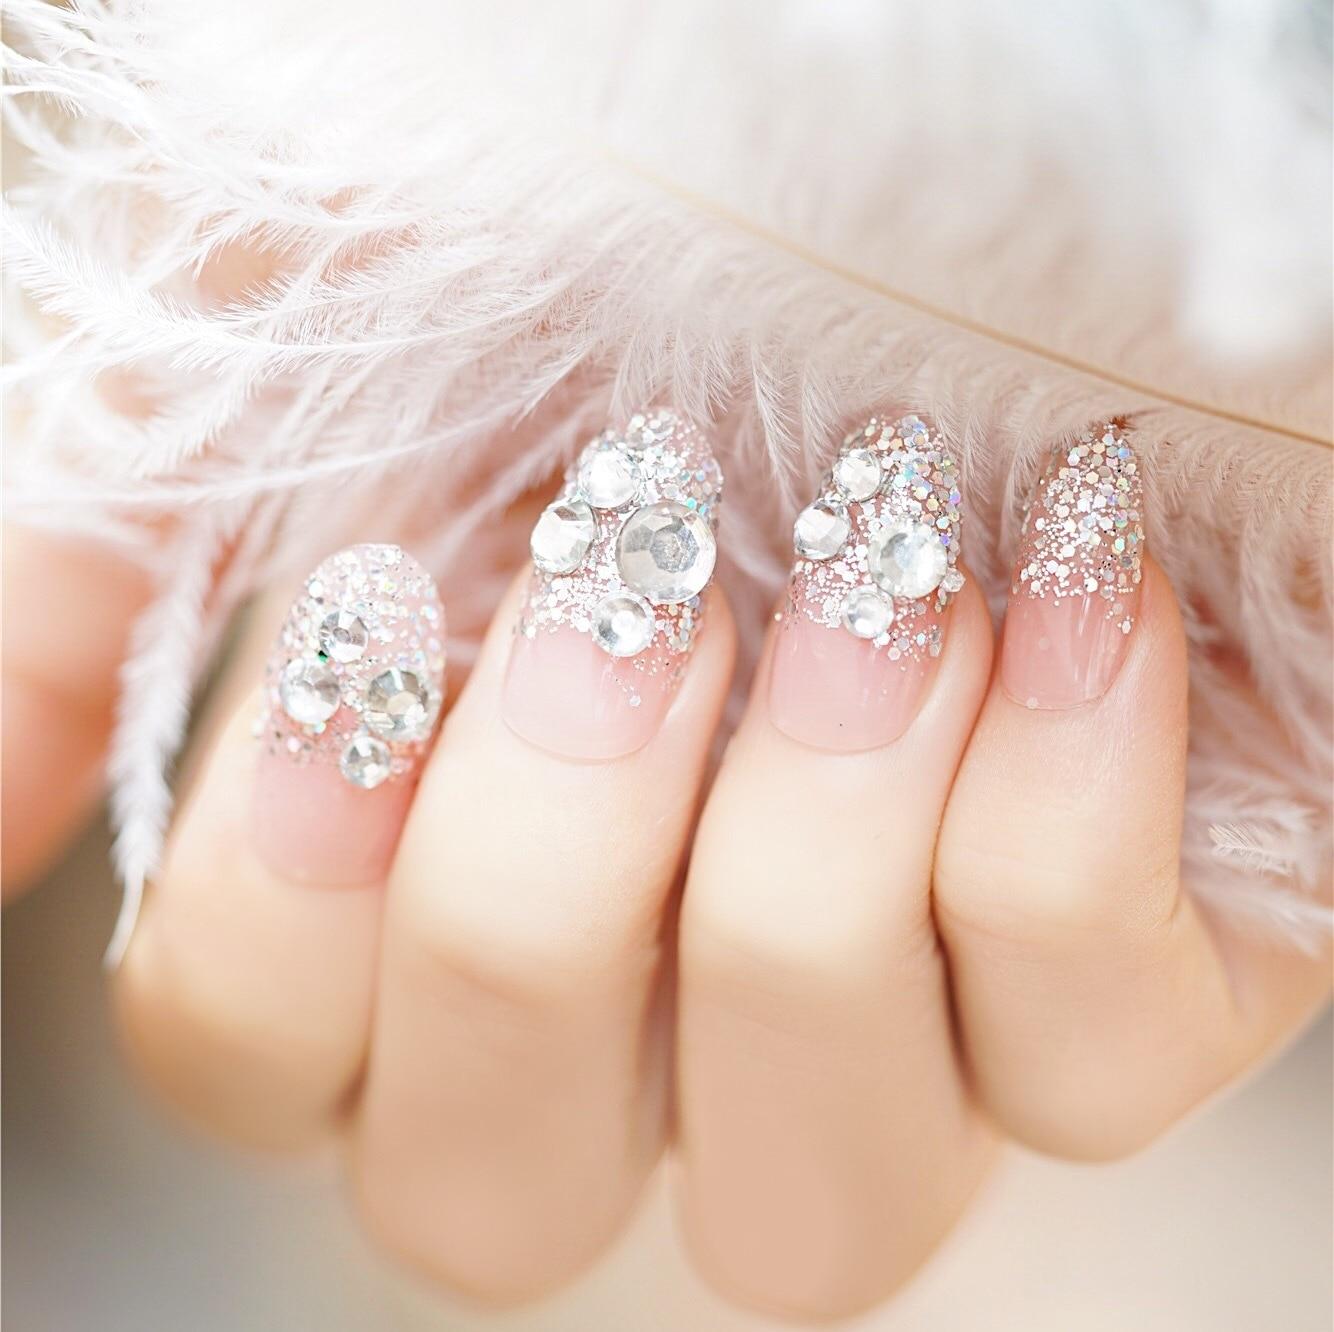 326-Naked Powder Round-Toe Flat-bottomed Diamond Gum-Finished Product Manicure Fake Nails Wholesale Bride Manicure Stickers